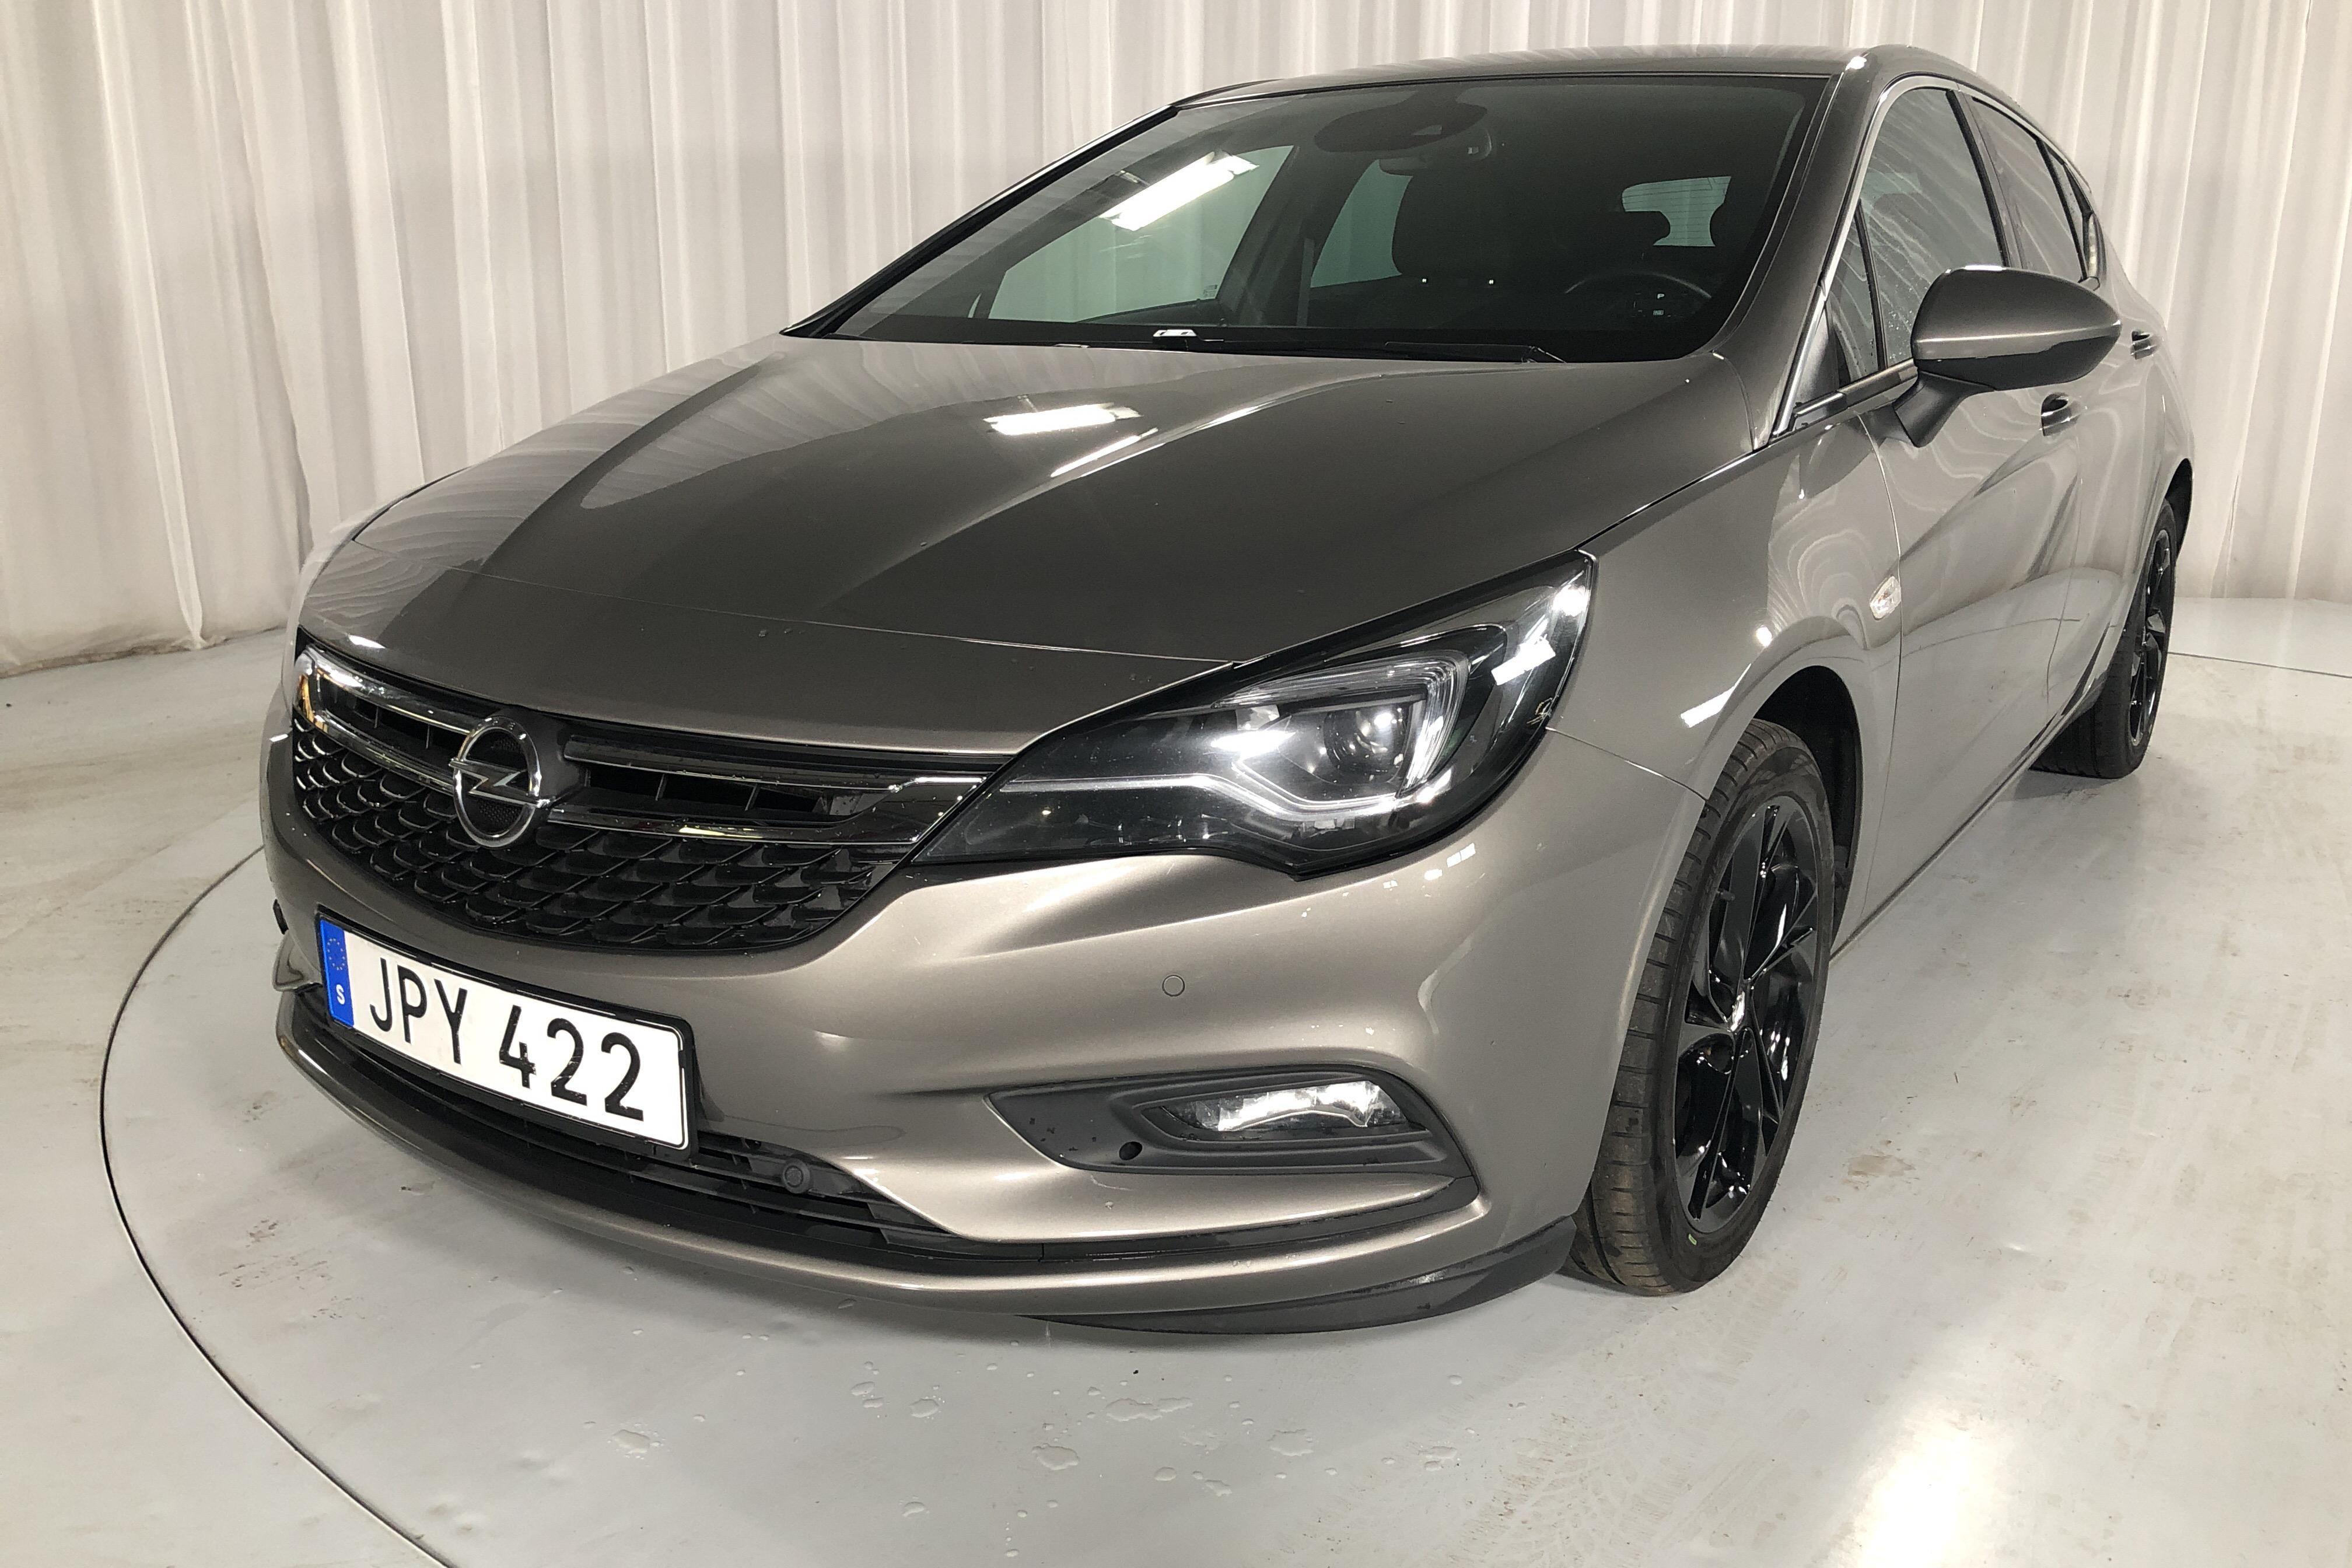 Opel Astra 1.6 BiTurbo ECOTEC 5dr (160hk)